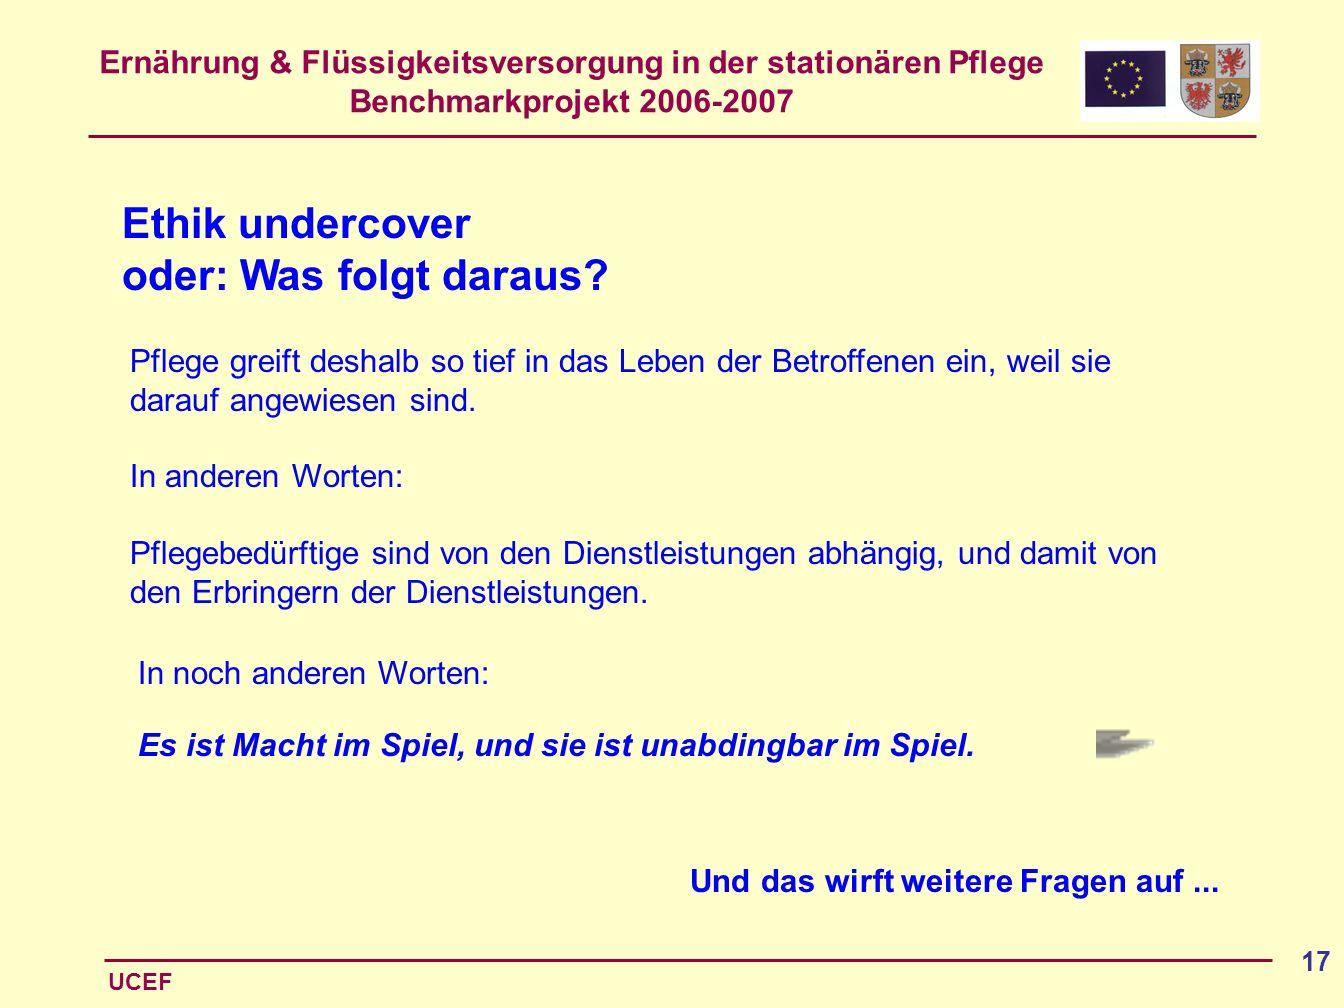 Ethik undercover oder: Was folgt daraus